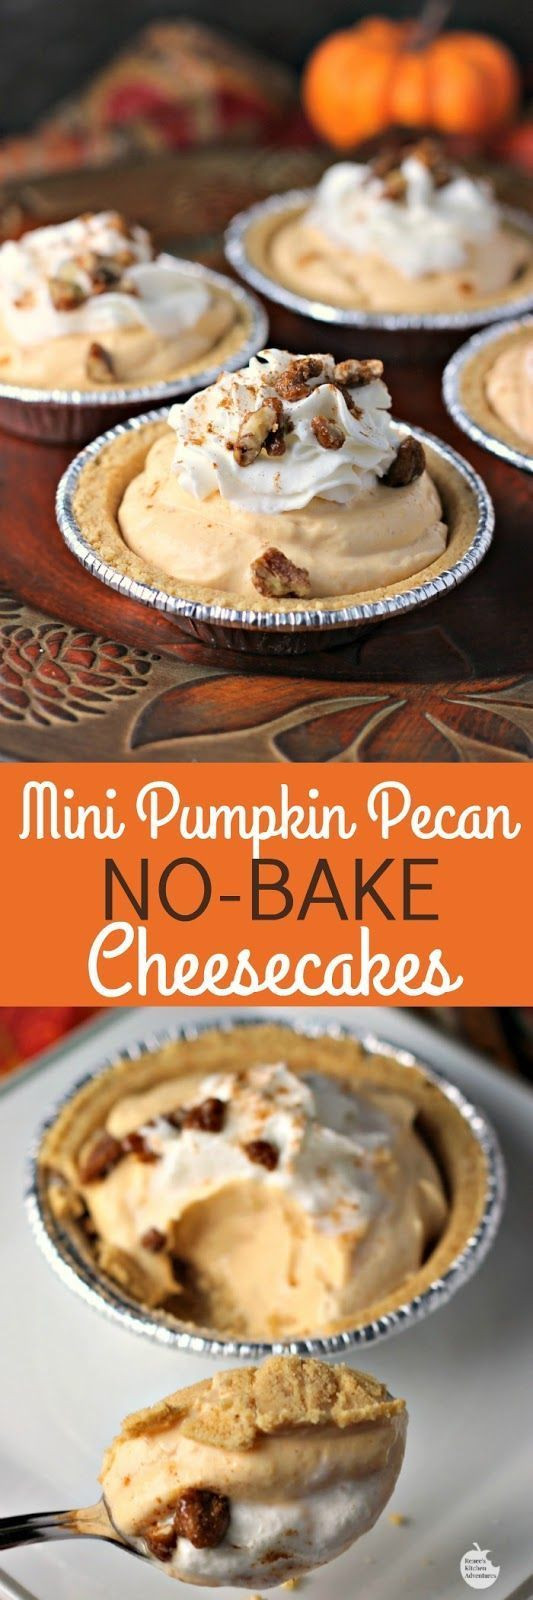 Mini Fall Desserts  Mini pumpkin pecan no bake cheesecakes recipe